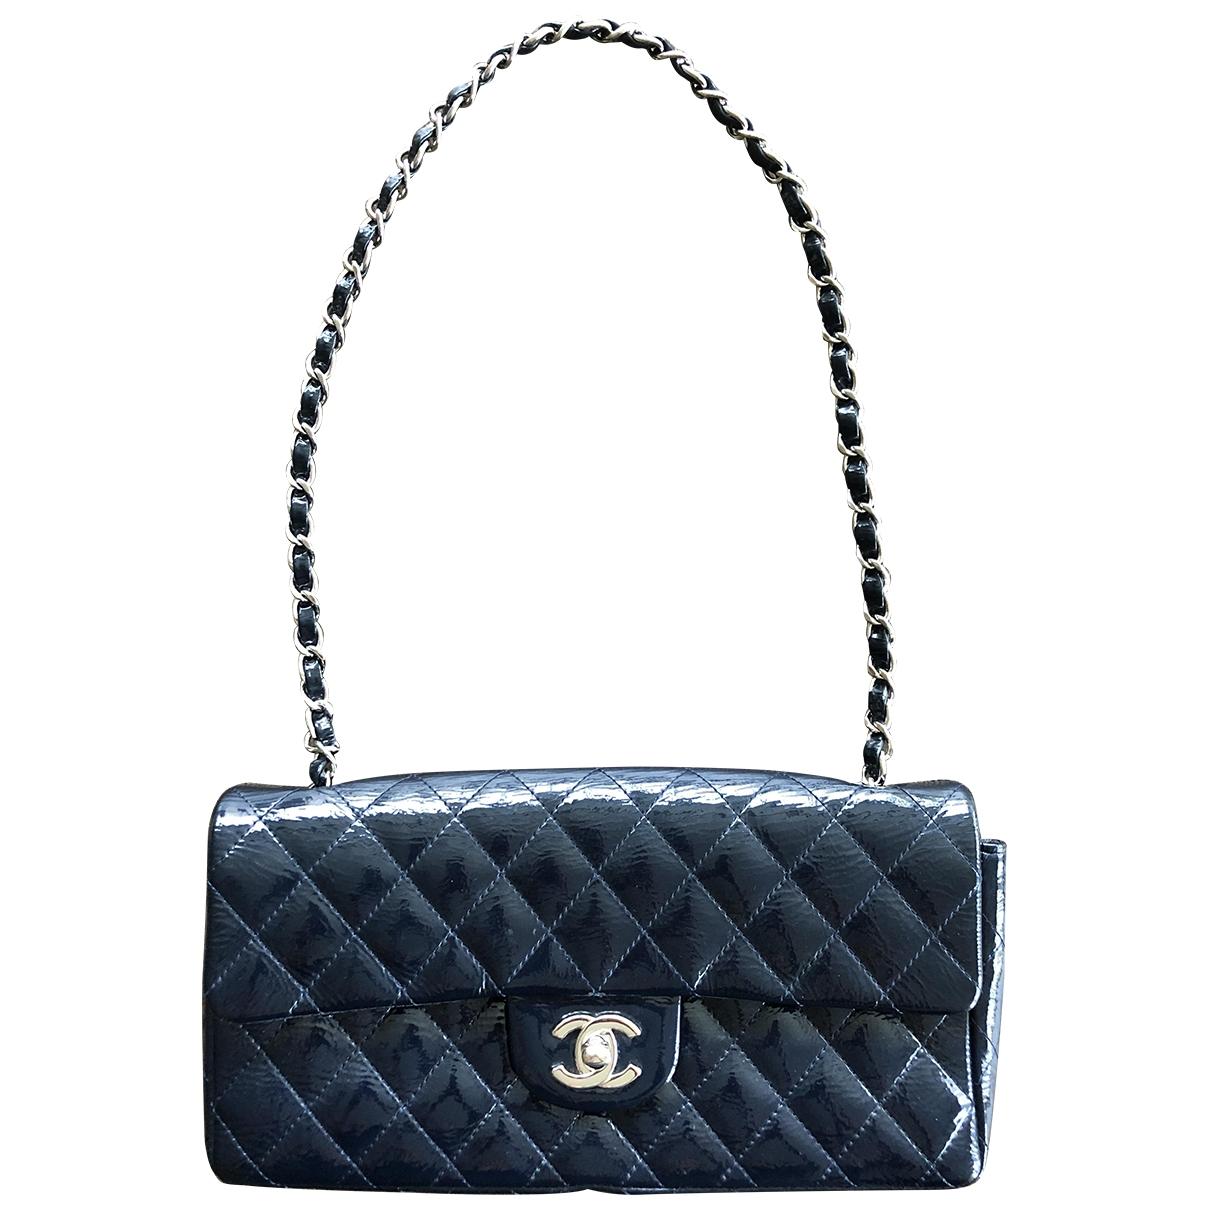 Chanel Timeless/Classique Handtasche in  Blau Lackleder